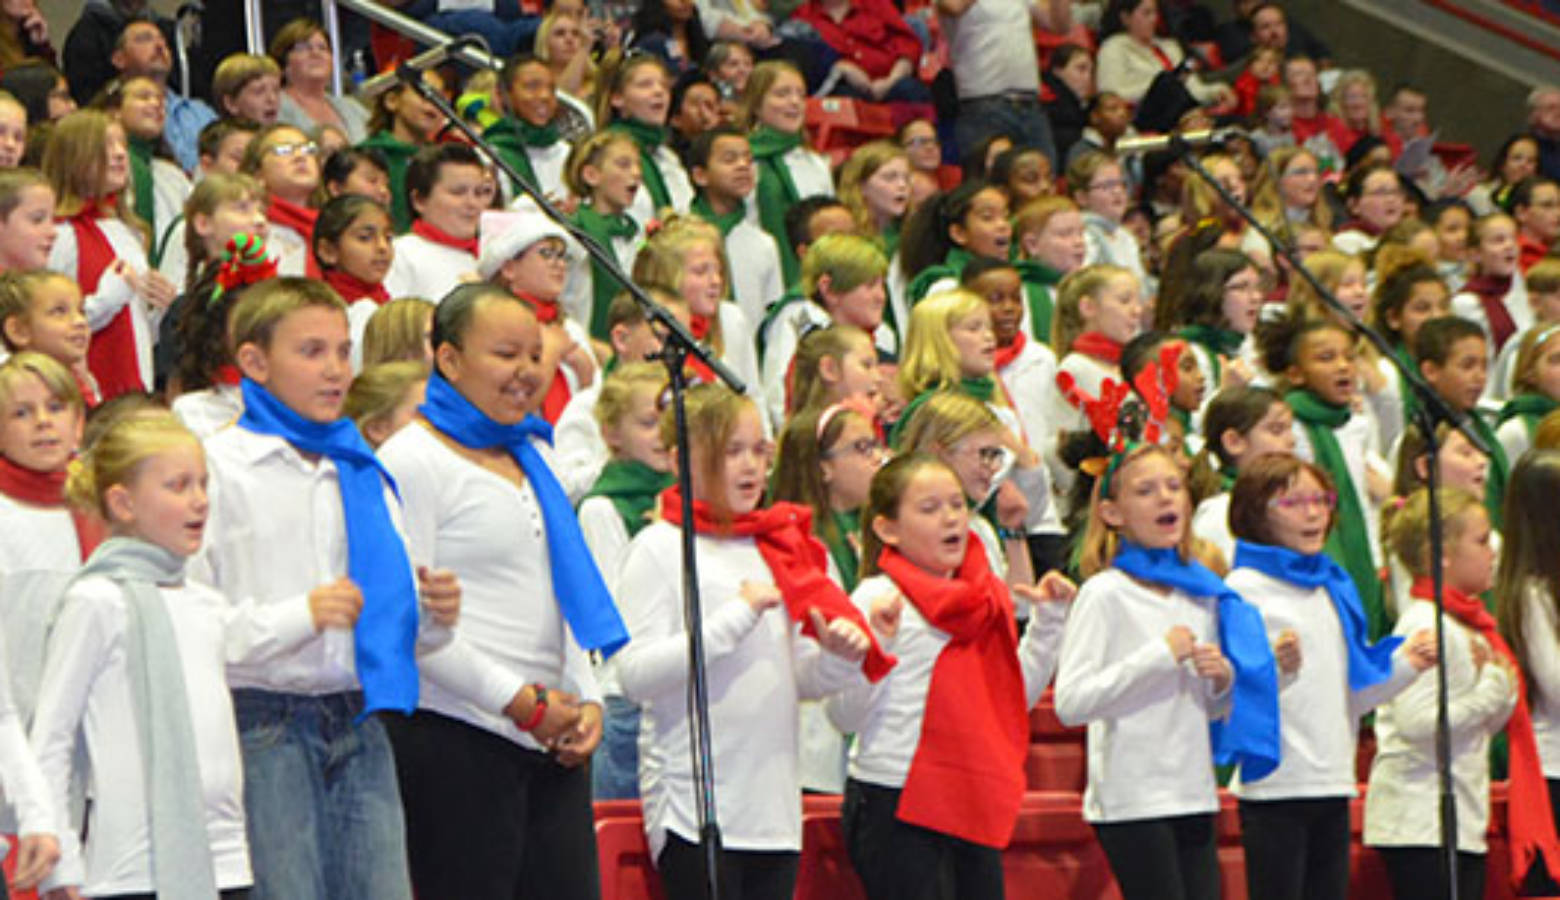 Muncie Christmas Sing 2021 Muncie S 82nd Annual Community Christmas Sing Sunday At Worthen Arena Indiana Public Radio